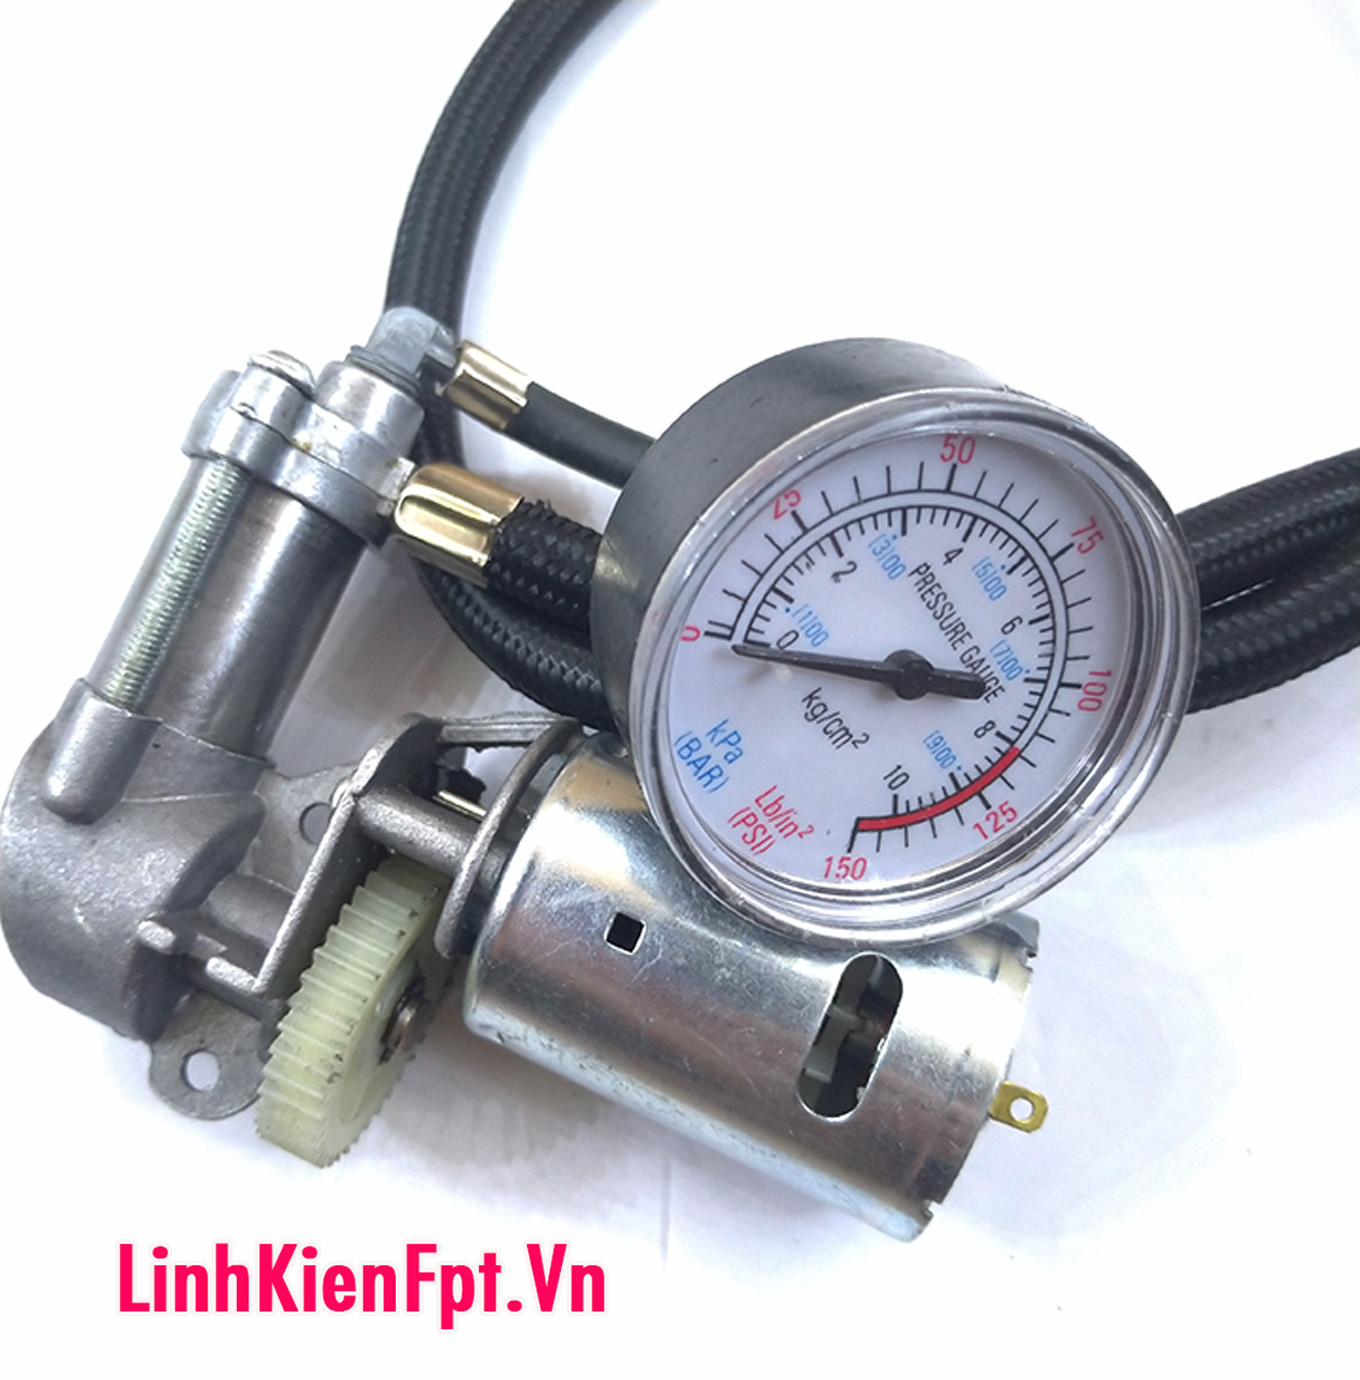 Bơm nén khí cao áp 12VDC Áp suất cao